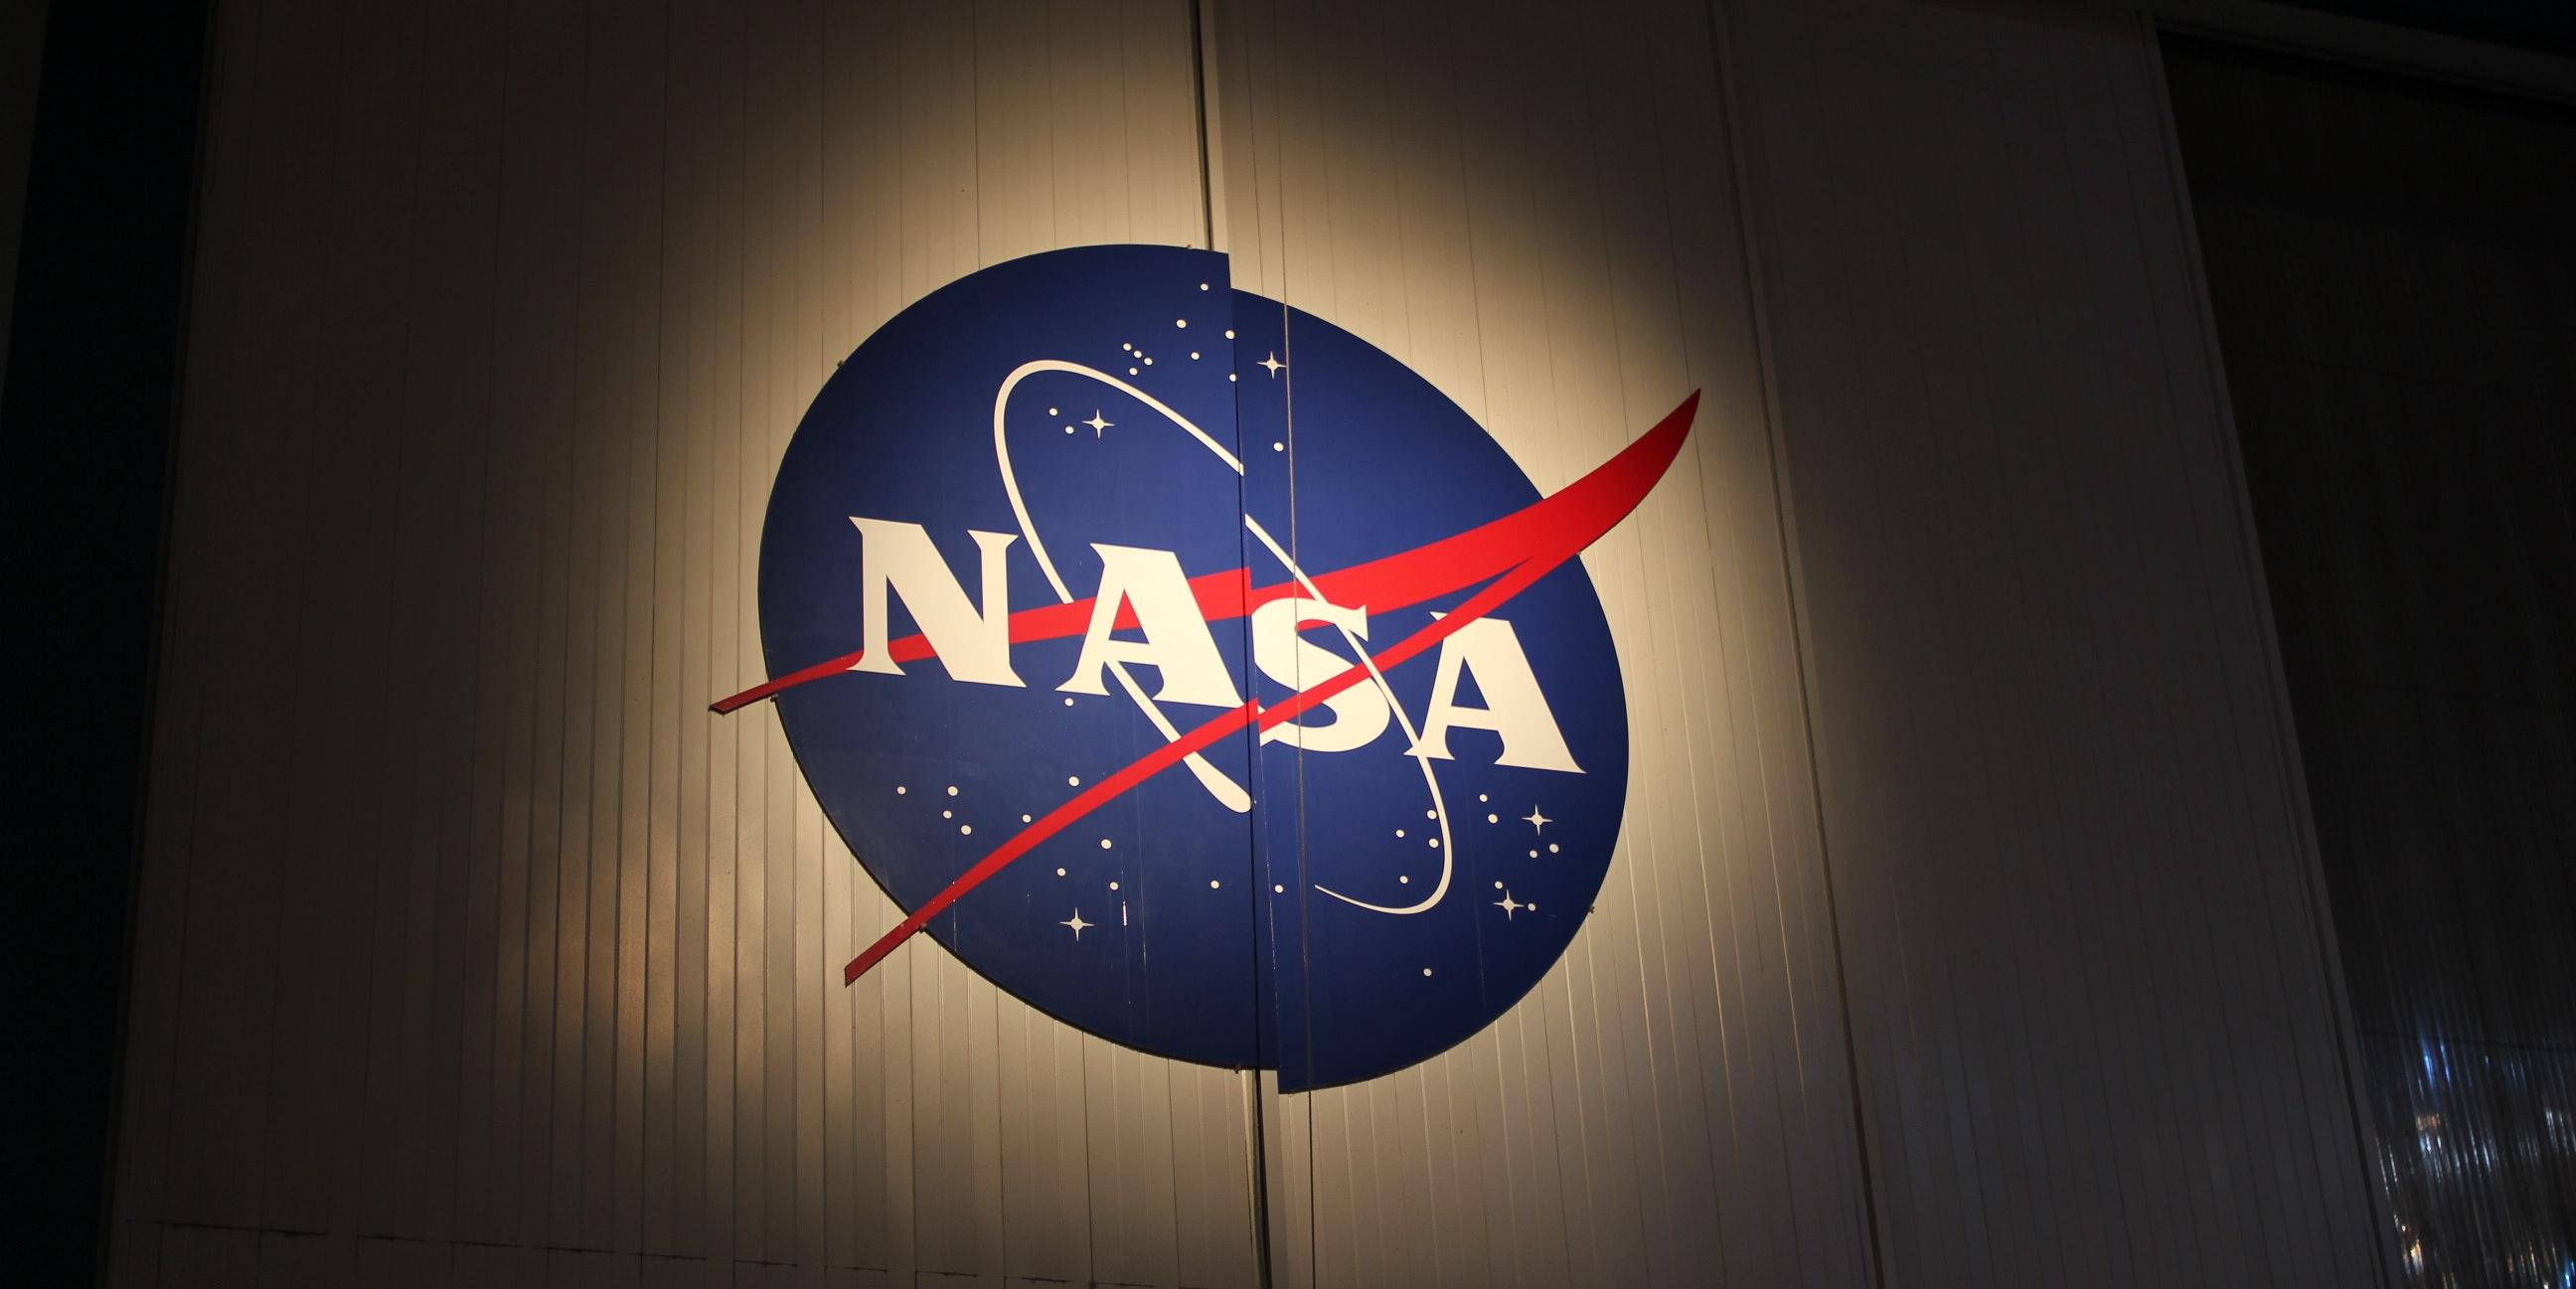 his Internal NASA Memo Addresses a Trump Presidency | Inverse